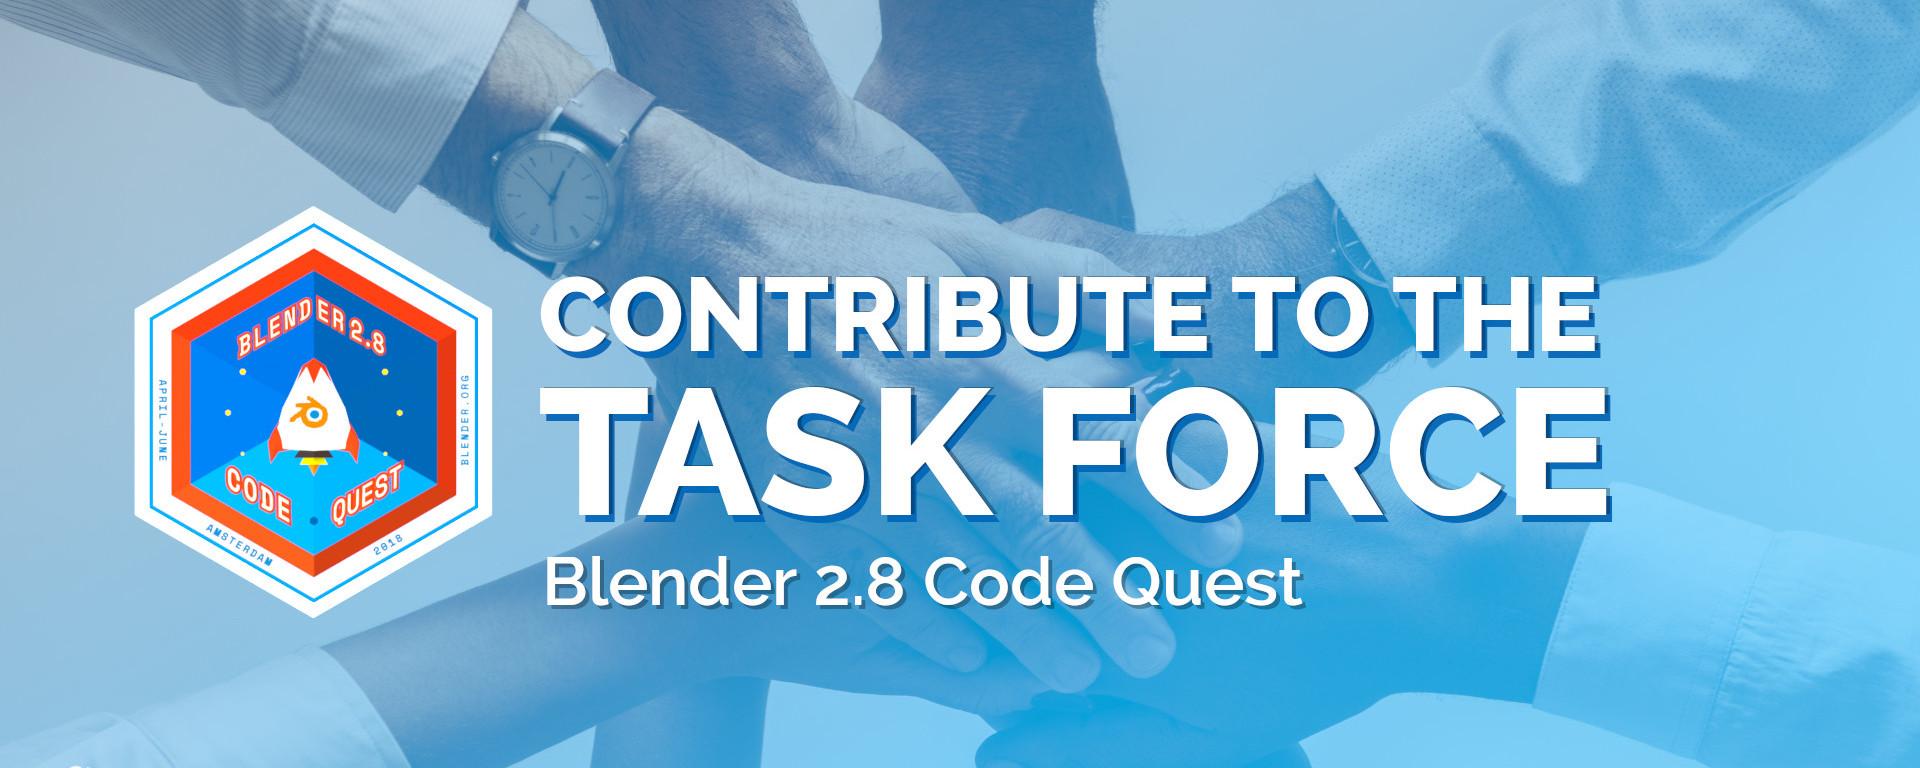 Blender 2.8 Task Force